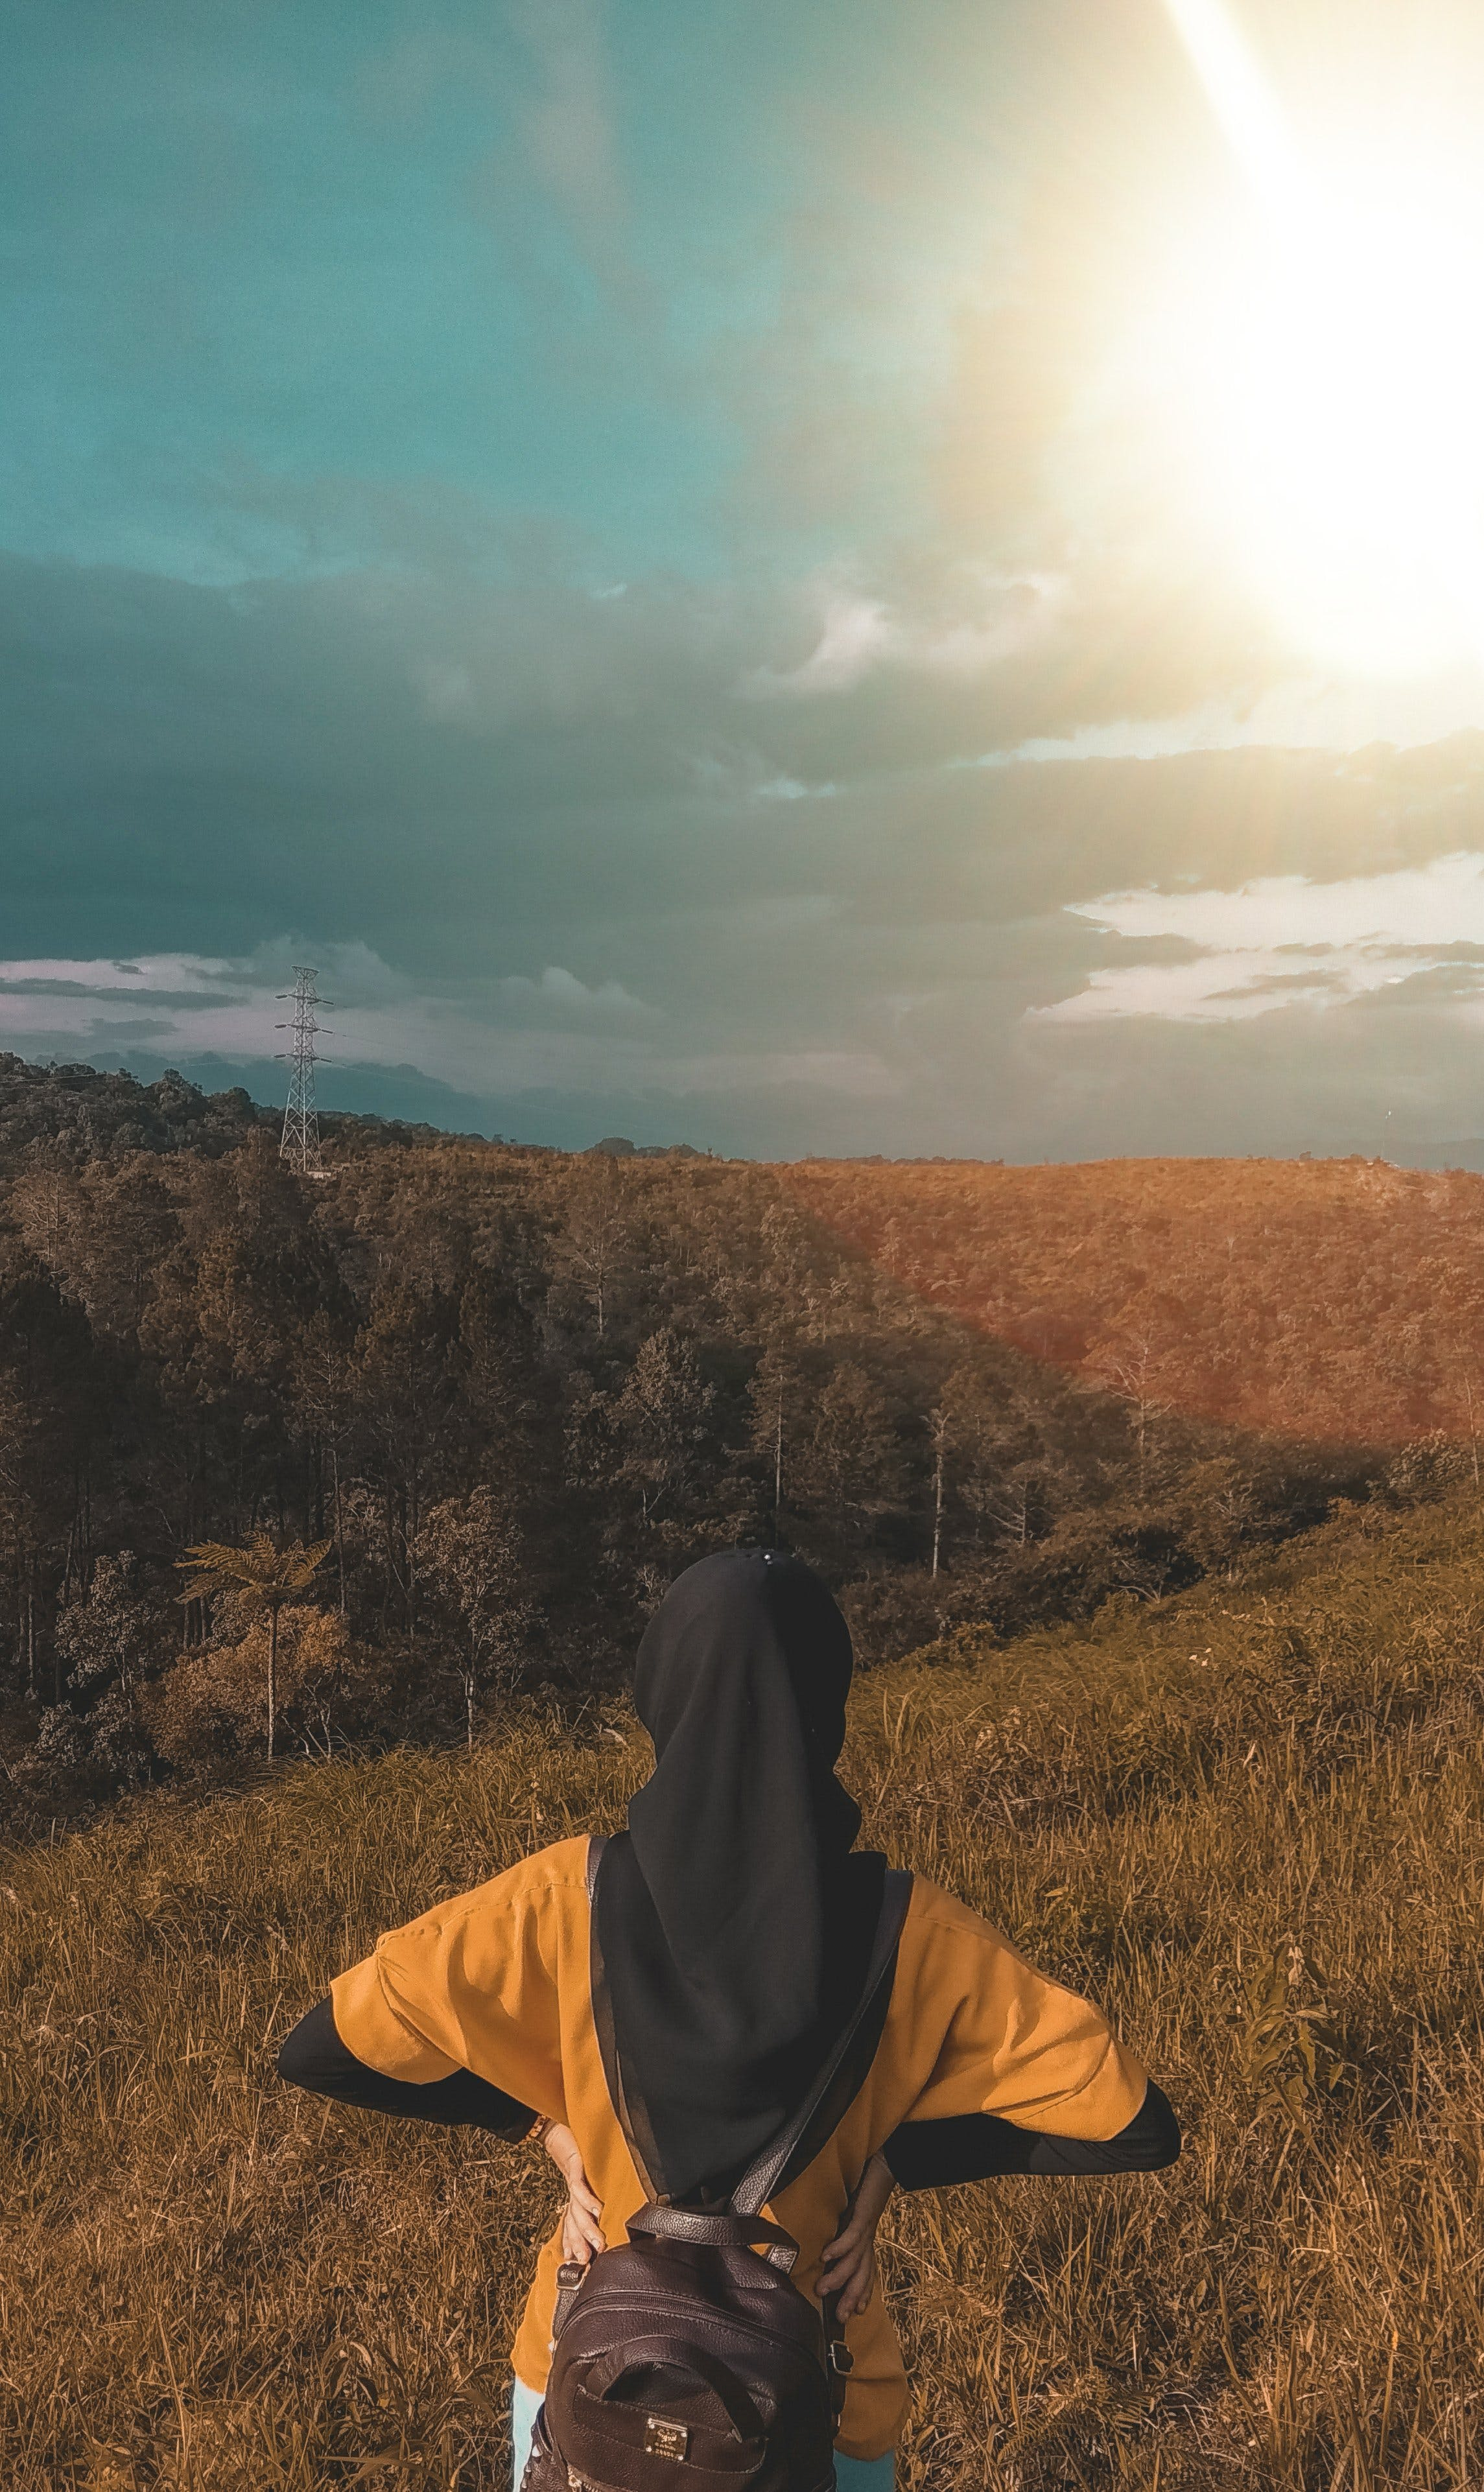 Gratis stockfoto met achtergrondlicht, akkerland, avond, berg